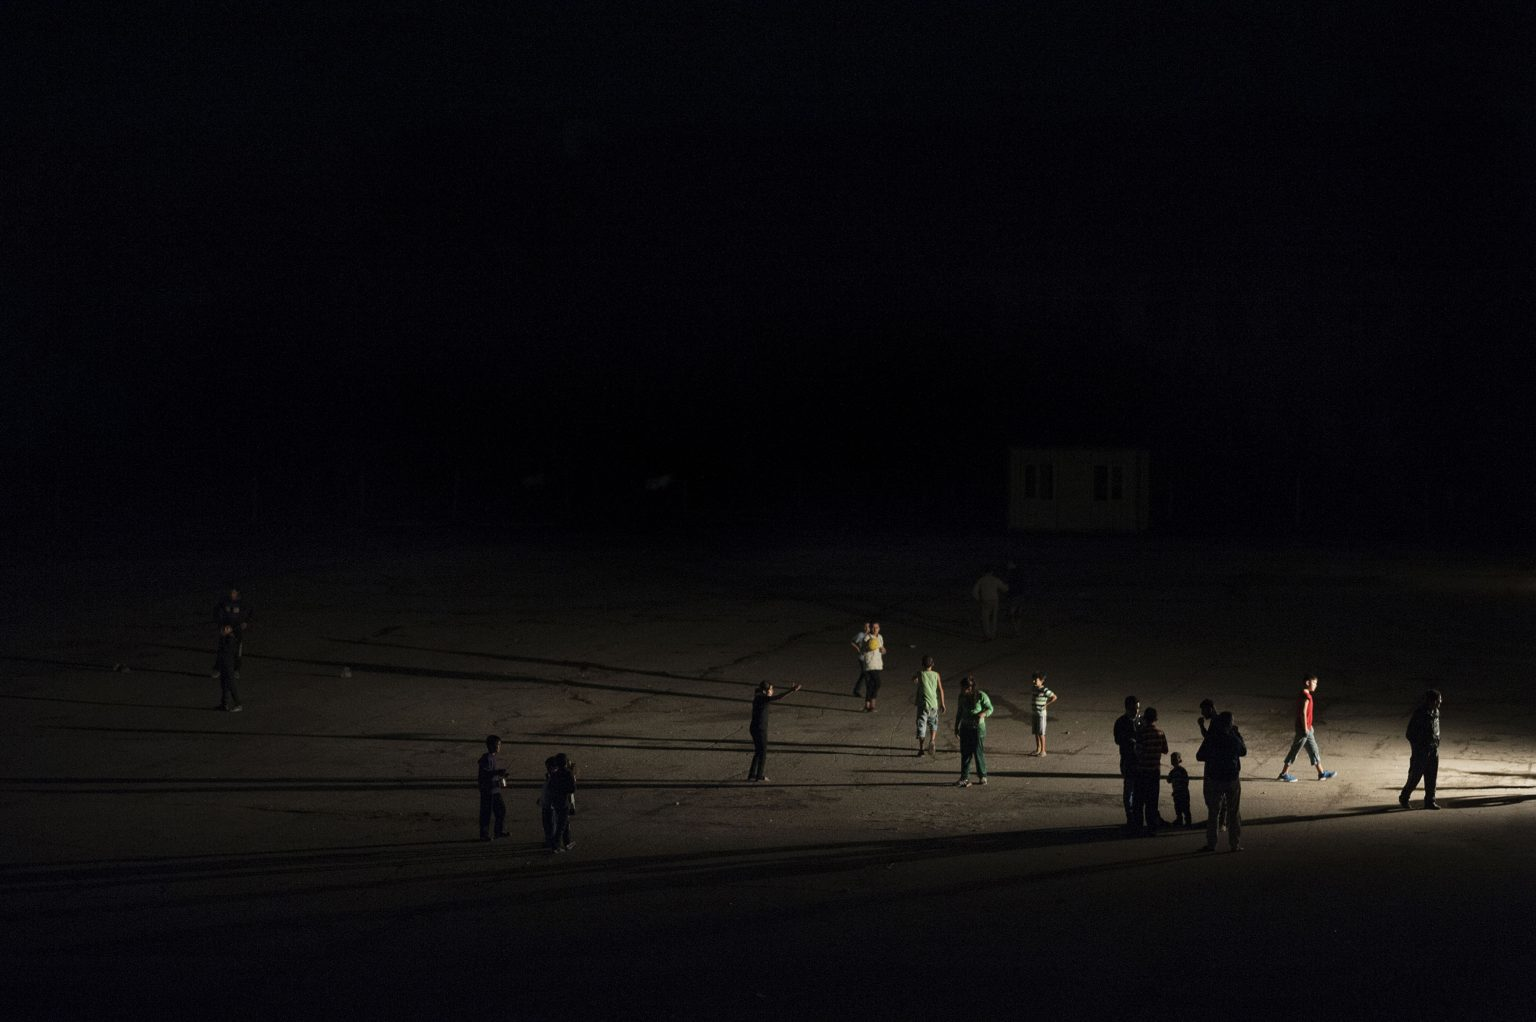 Harmanli, Bulgaria 2014 - Asylum seekers in the refugee center managed by the government.  >< Harmanli, Bulgaria 2014 - Richiedenti asilo nel campo profughi gestito dal governo.   *** Local Caption *** 00543850